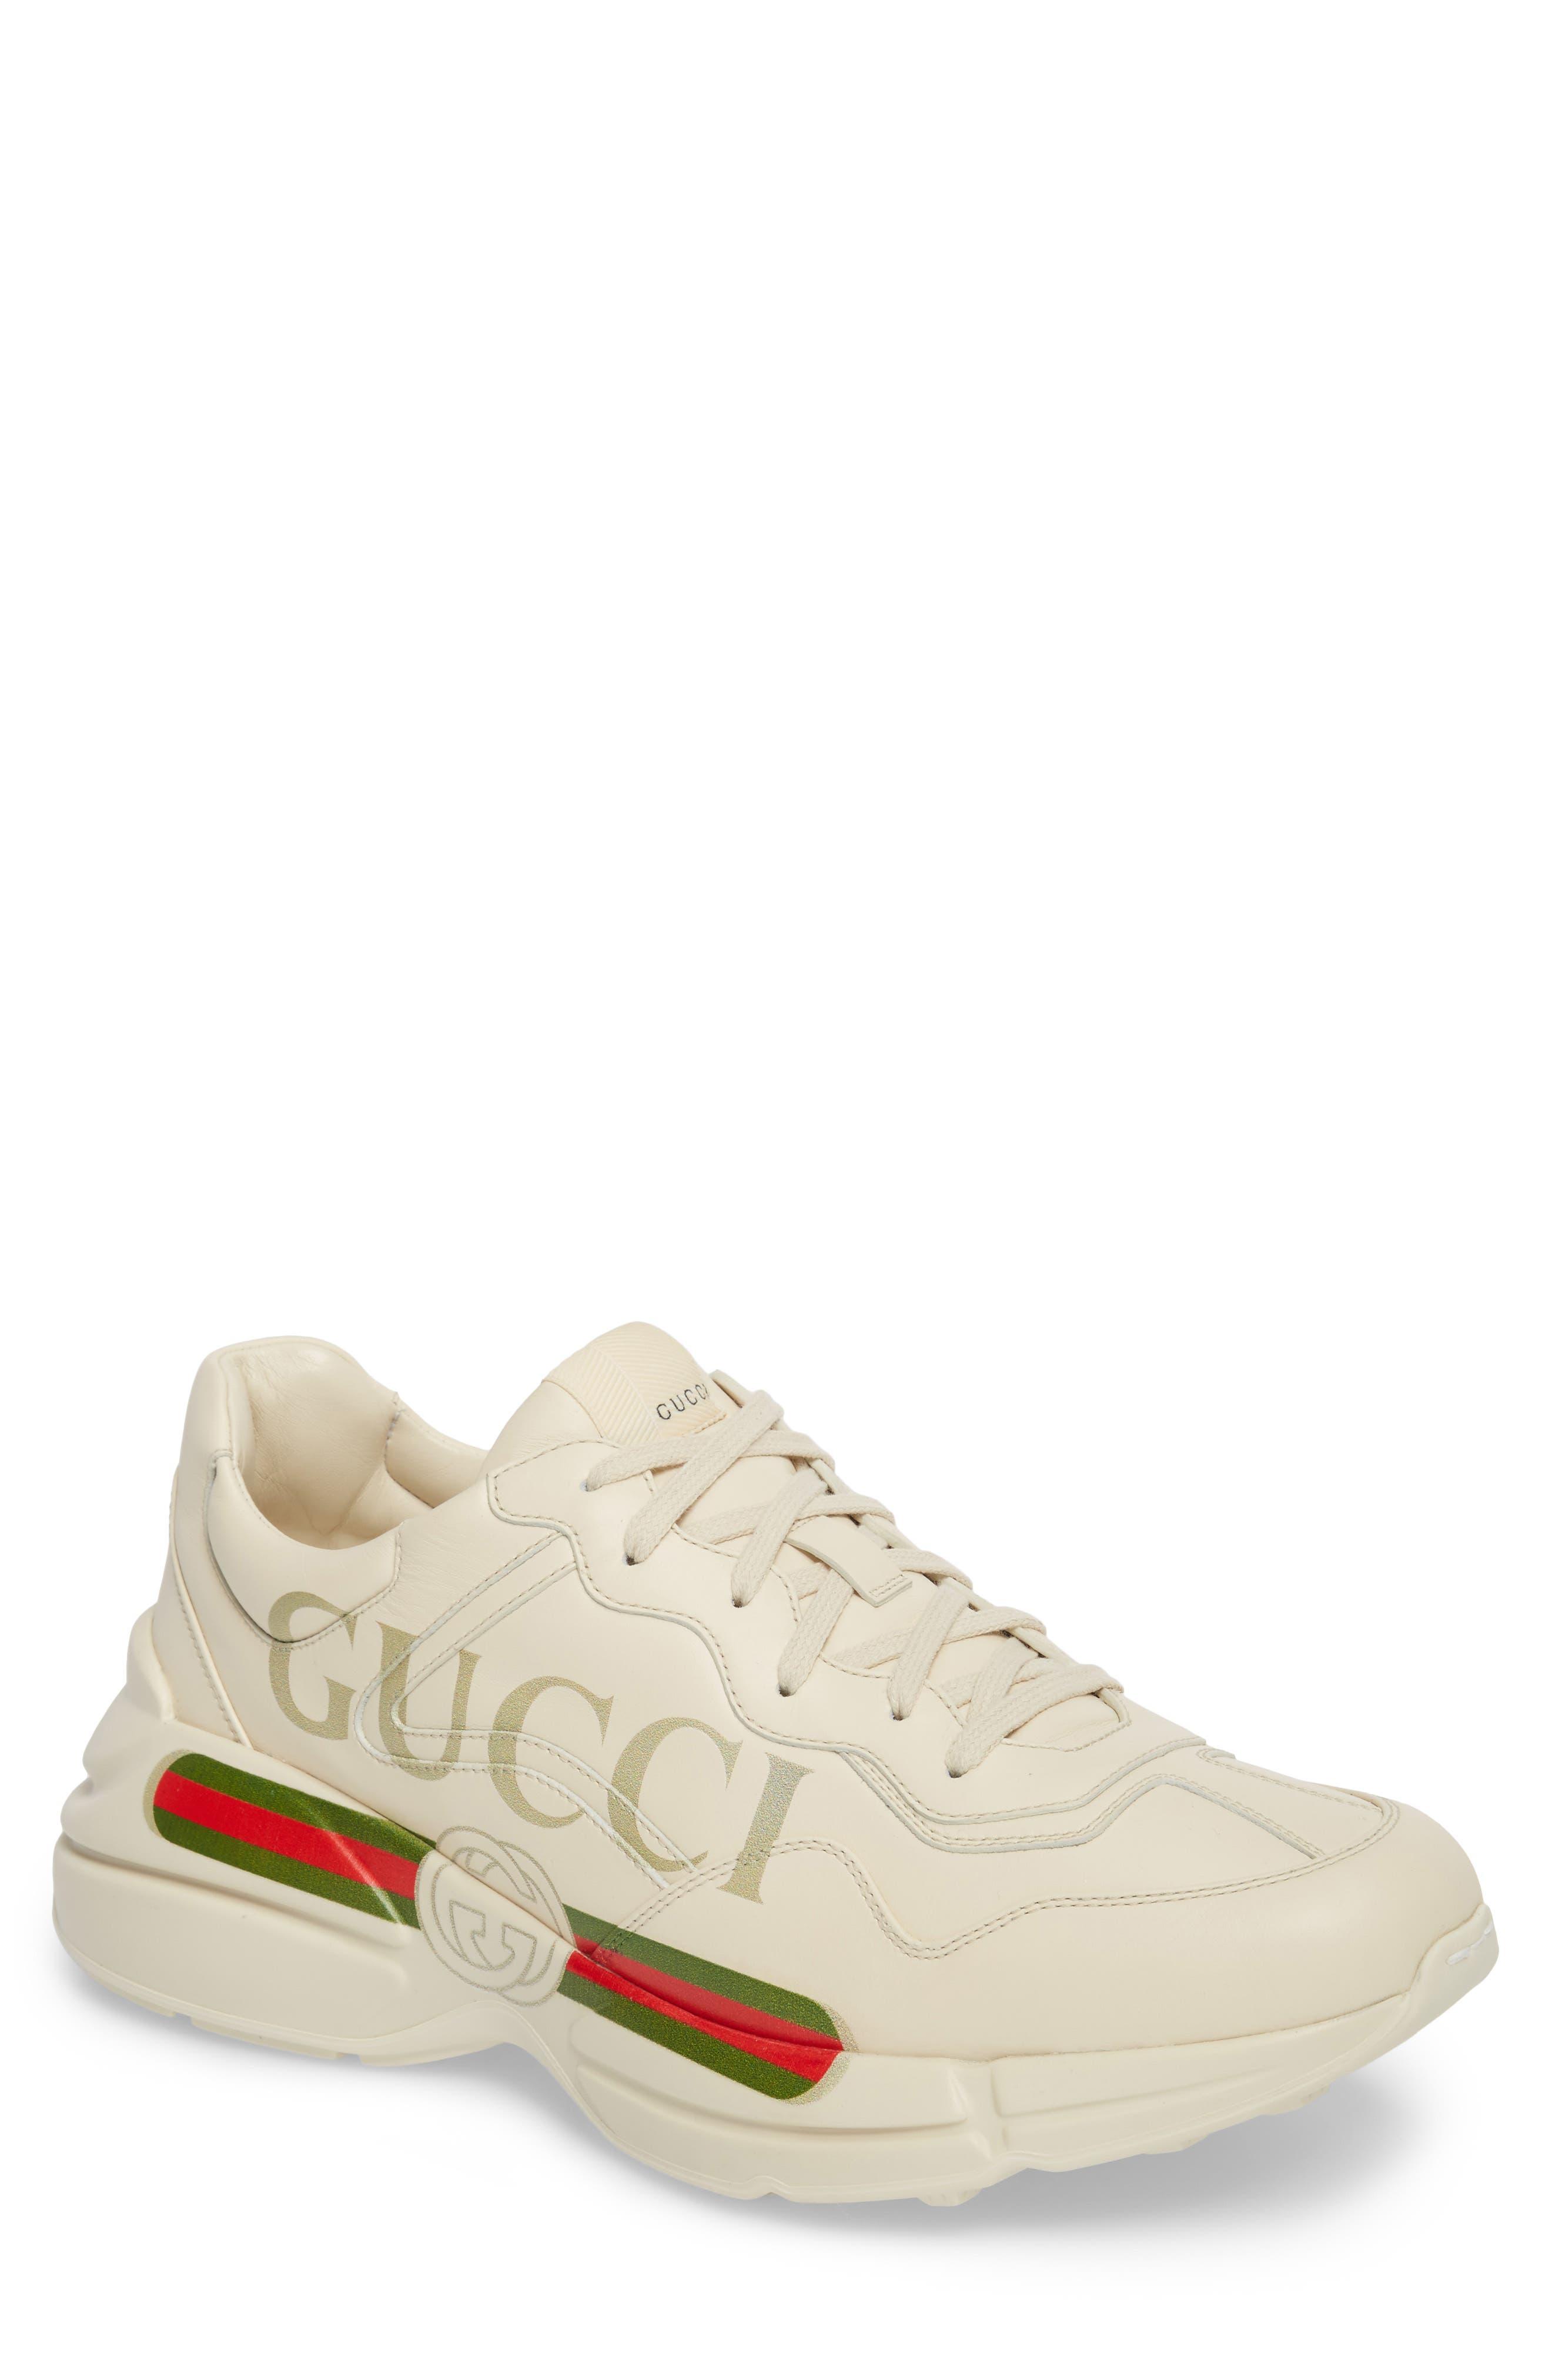 GUCCI, Logo Leather Sneaker, Main thumbnail 1, color, WHITE PRINT